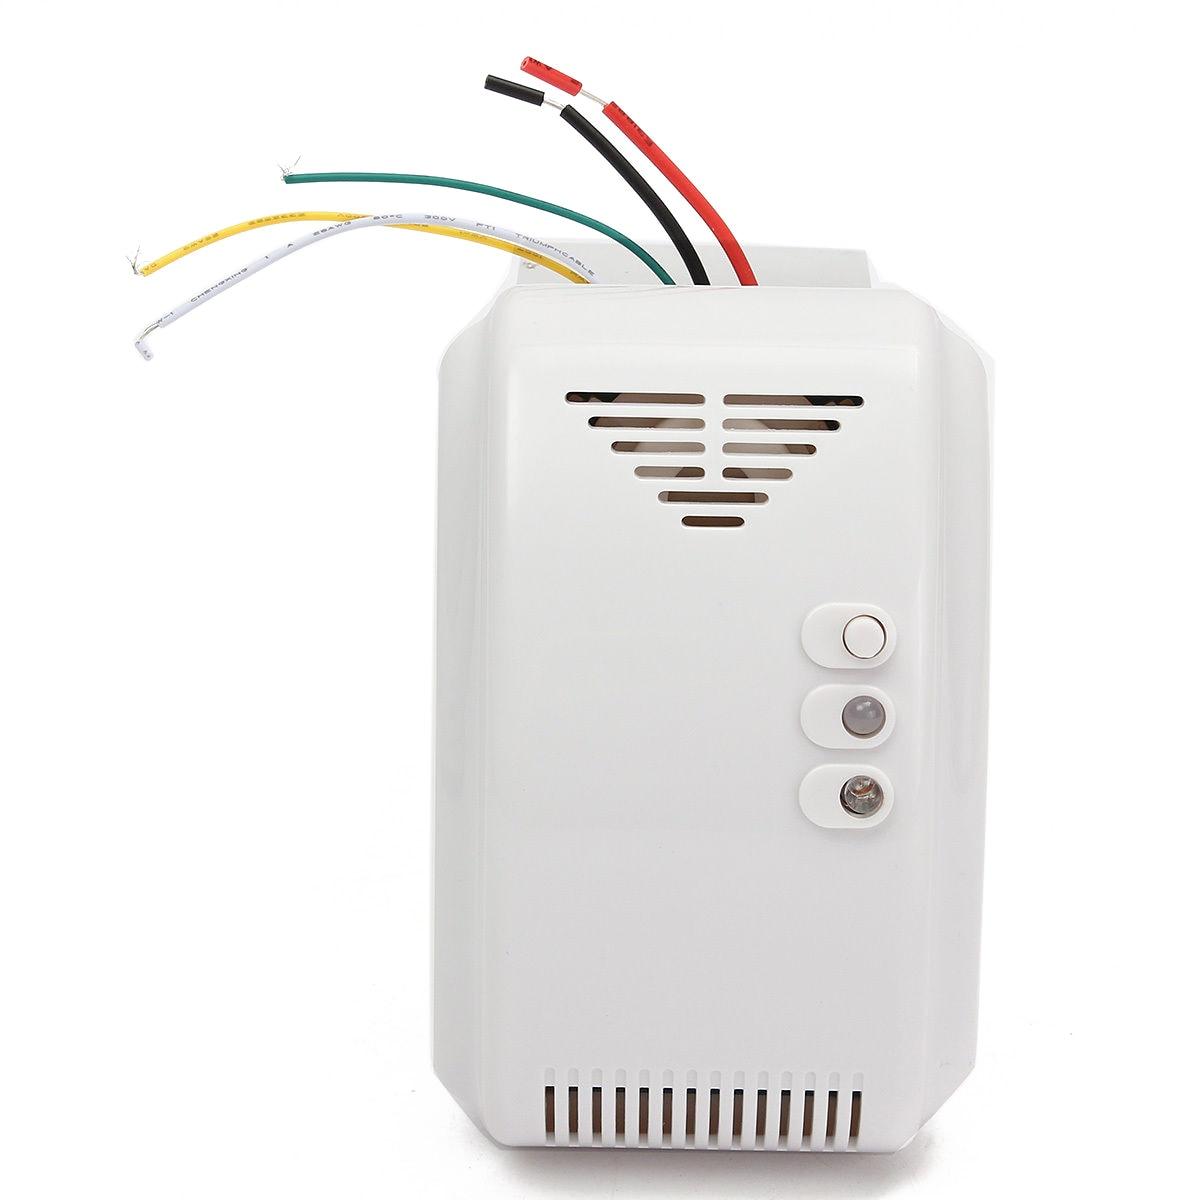 1pc Stable White Gas Leak Sensor Alarm 12V DC Propane Butane LPG Natural Coal Gas Detector for Leisure Craft Vehicles Mayitr